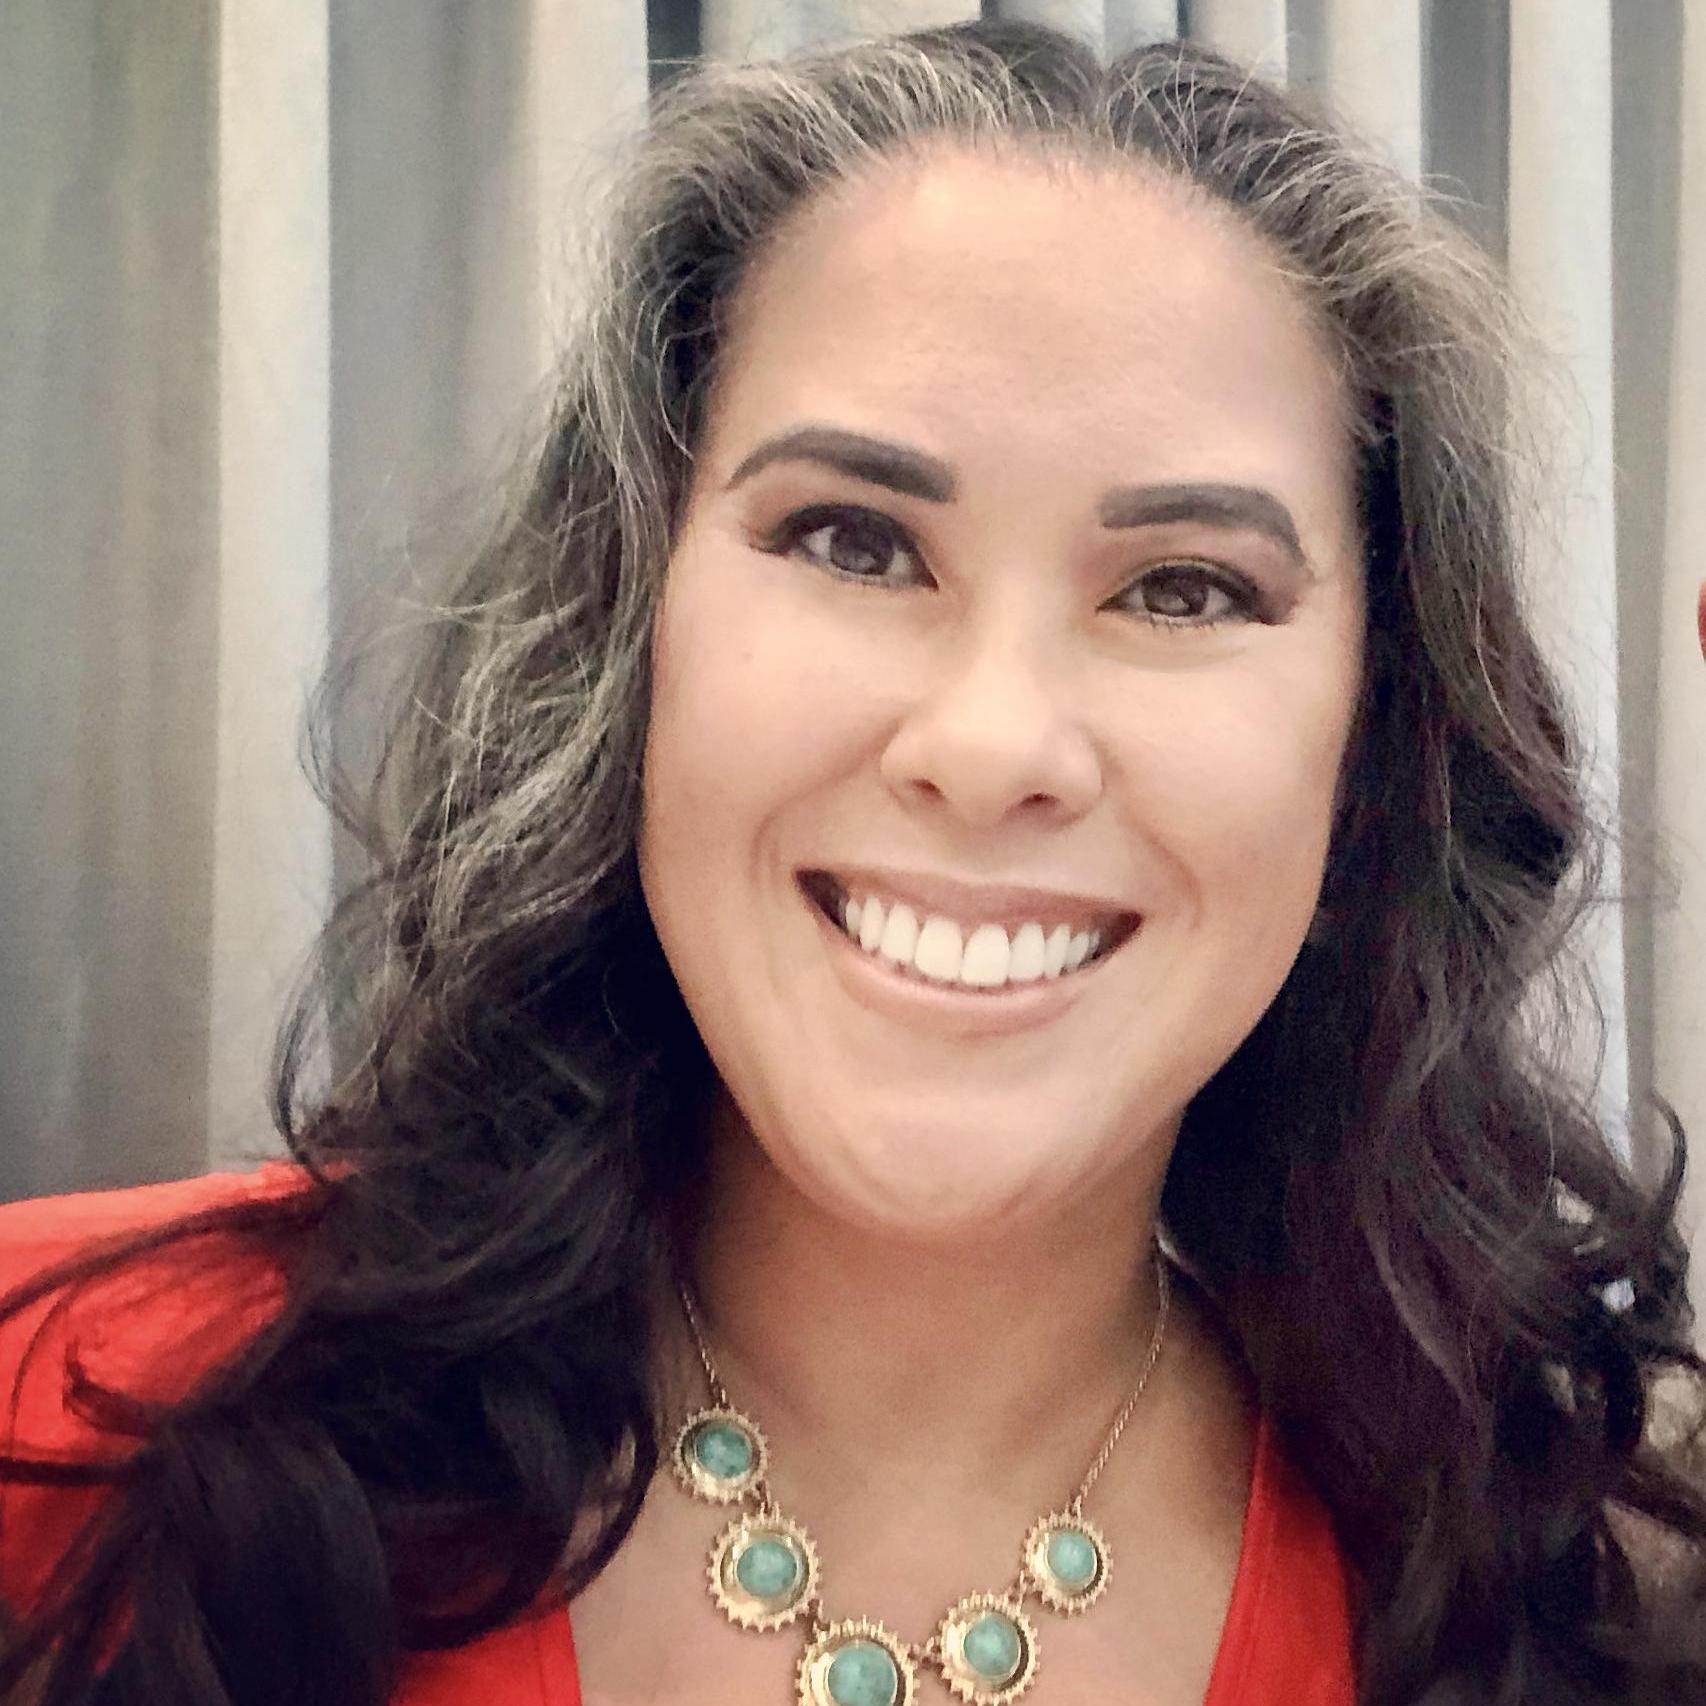 Jomeline Balatayo, Ph.D.'s Profile Photo